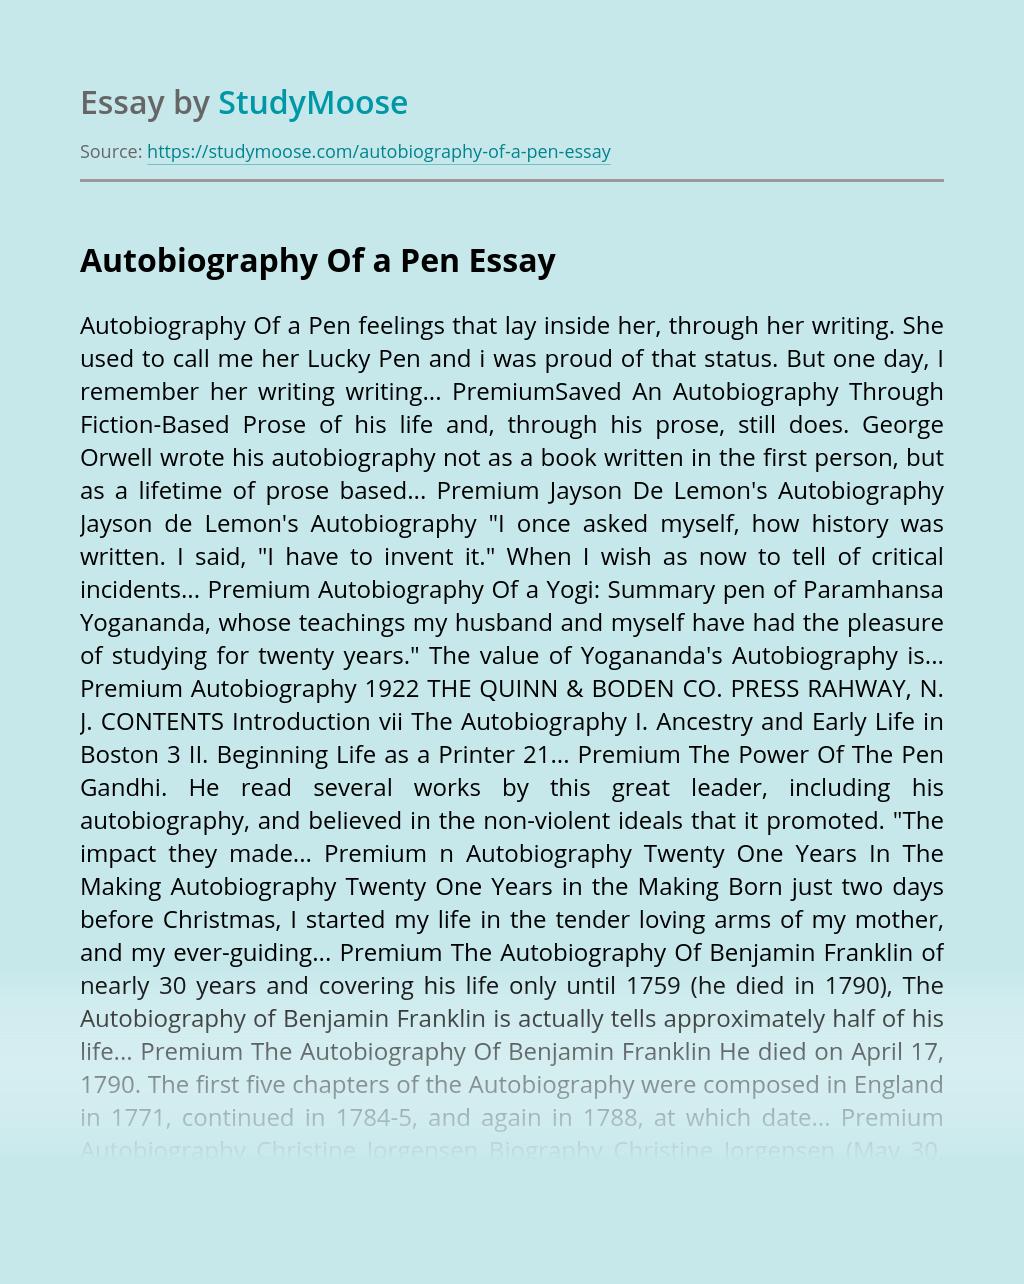 Autobiography Of a Pen